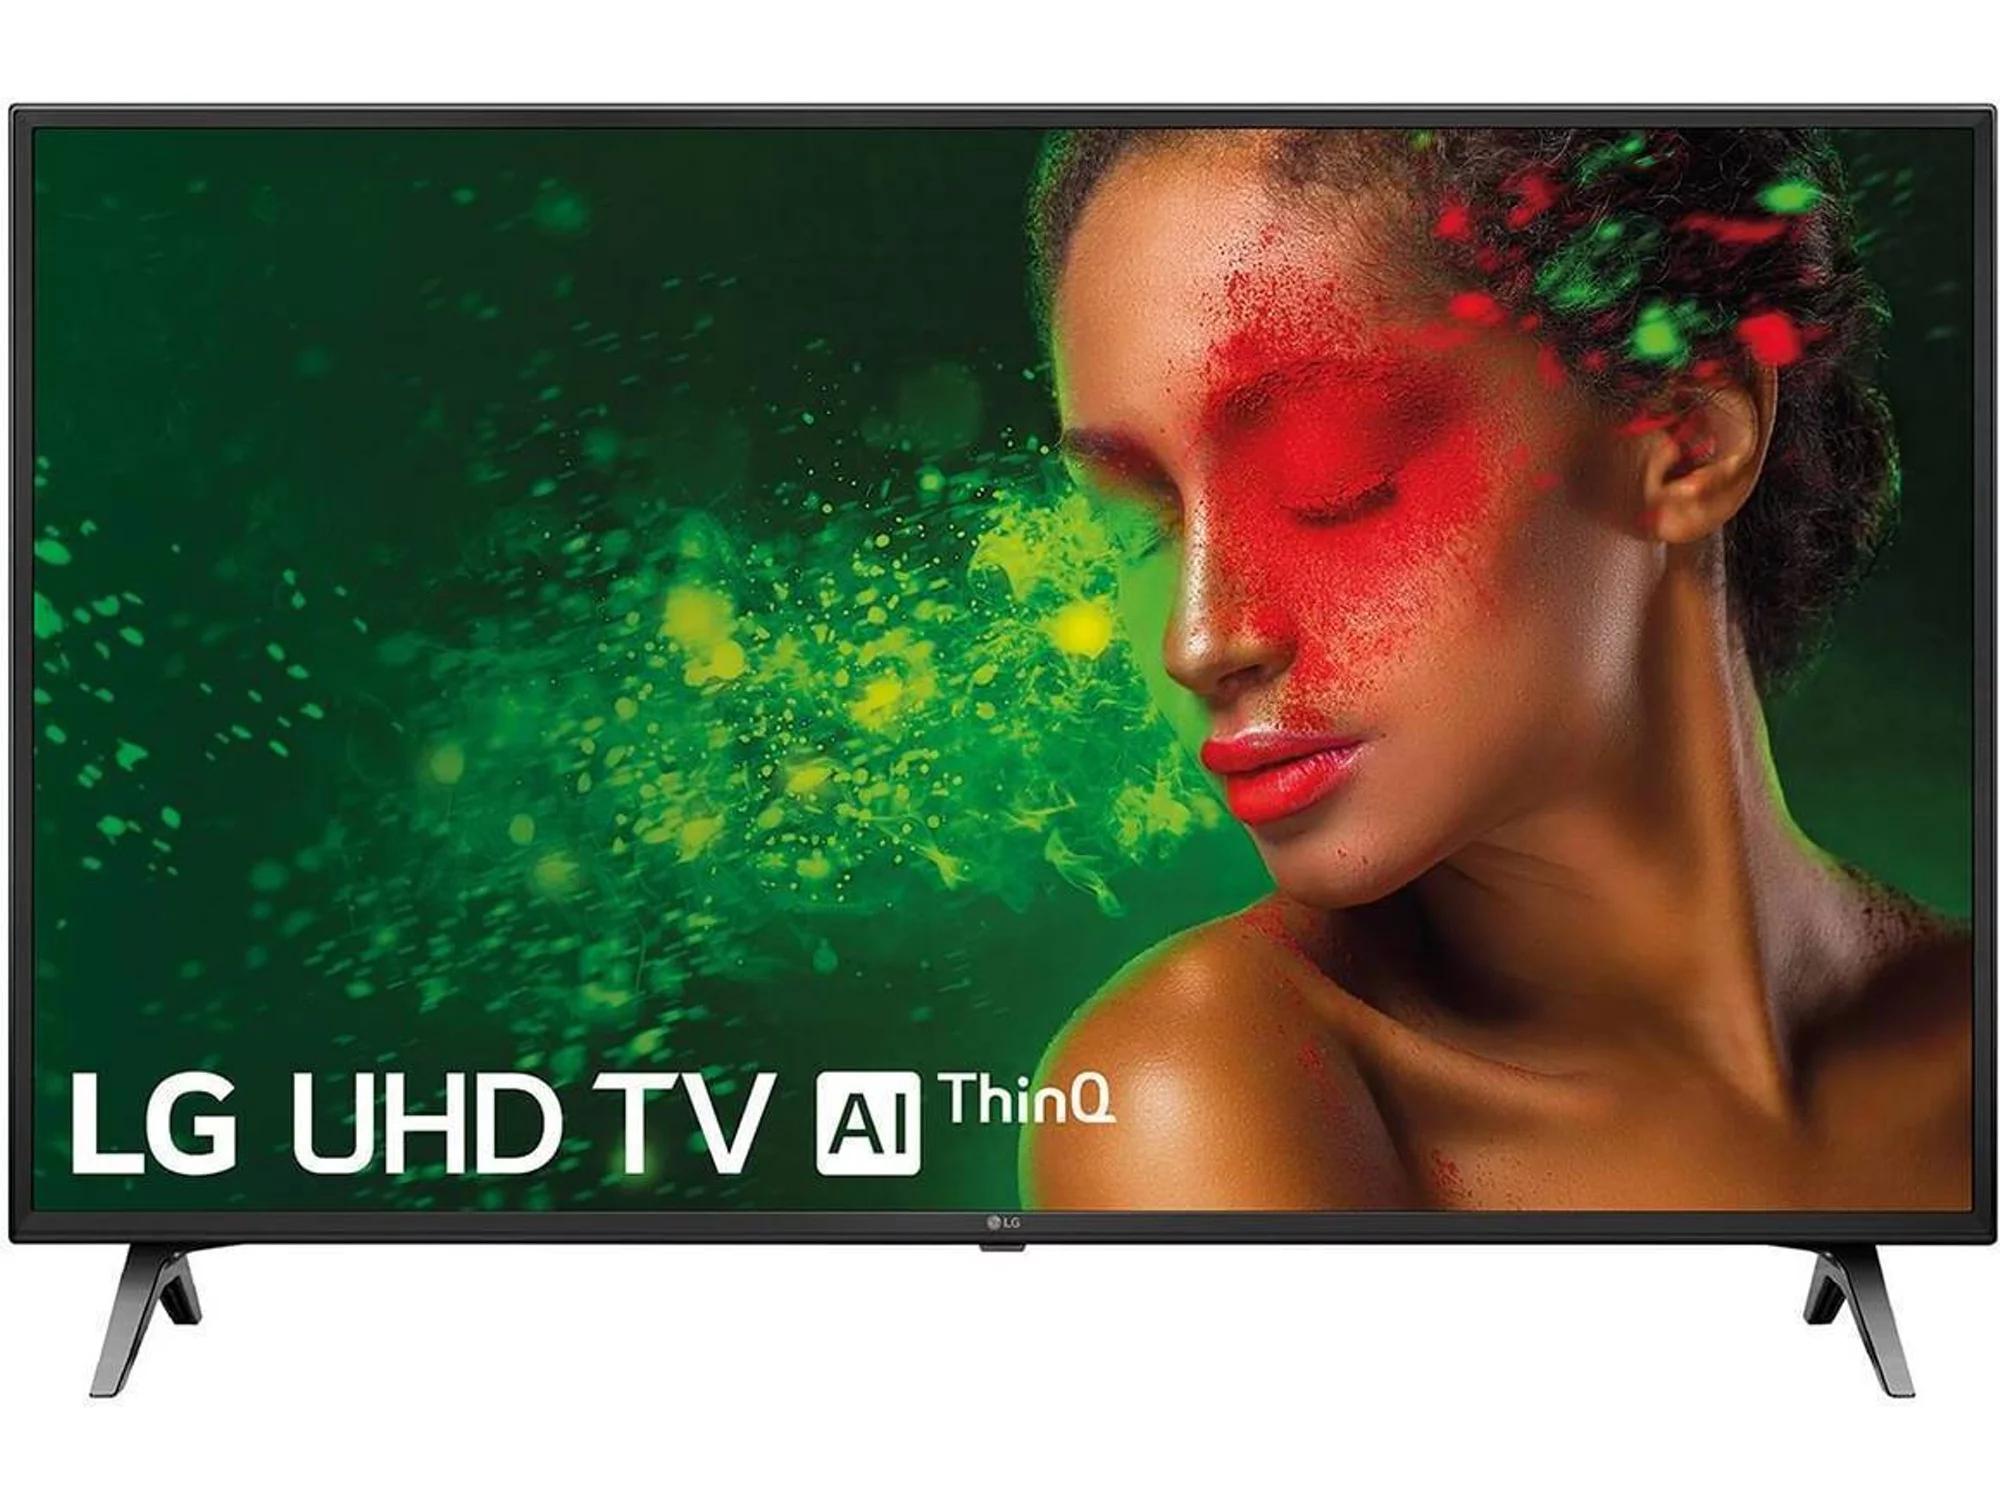 TV LG 60UM7100PLB (LED - 60'' - 152 cm - 4K Ultra HD - Smart TV)